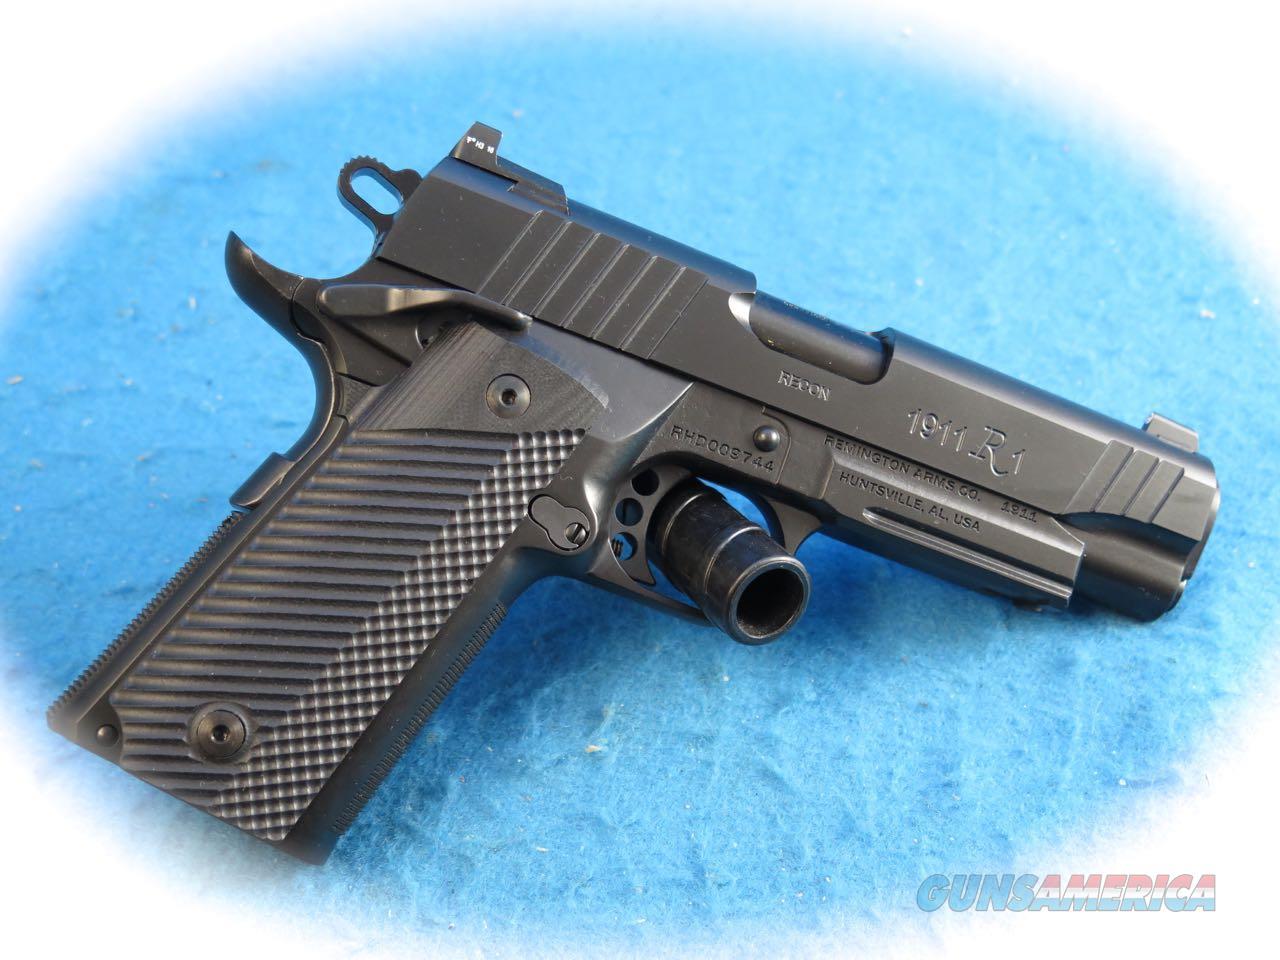 Remington 1911 R1 Recon Commander 9mm Pistol Model 96490 **New**  Guns > Pistols > Remington Pistols - Modern > 1911